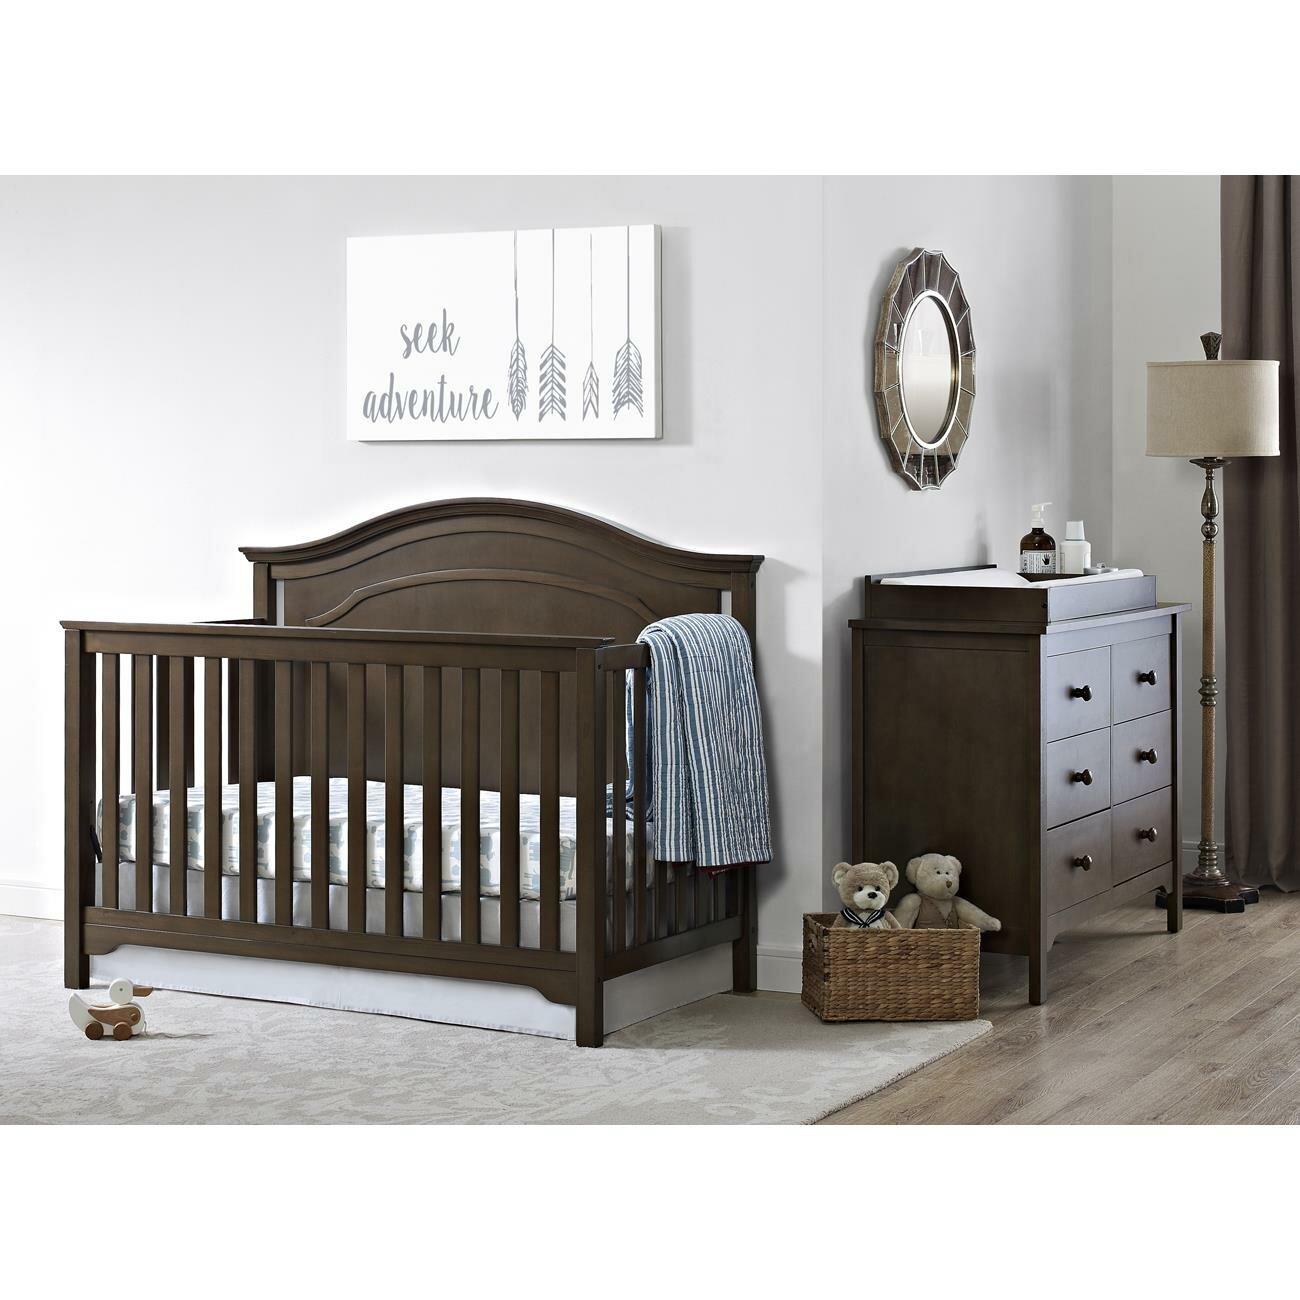 Emma iron crib for sale - Baby Relax Eddie Bauer Hayworth 4 In 1 Convertible Crib